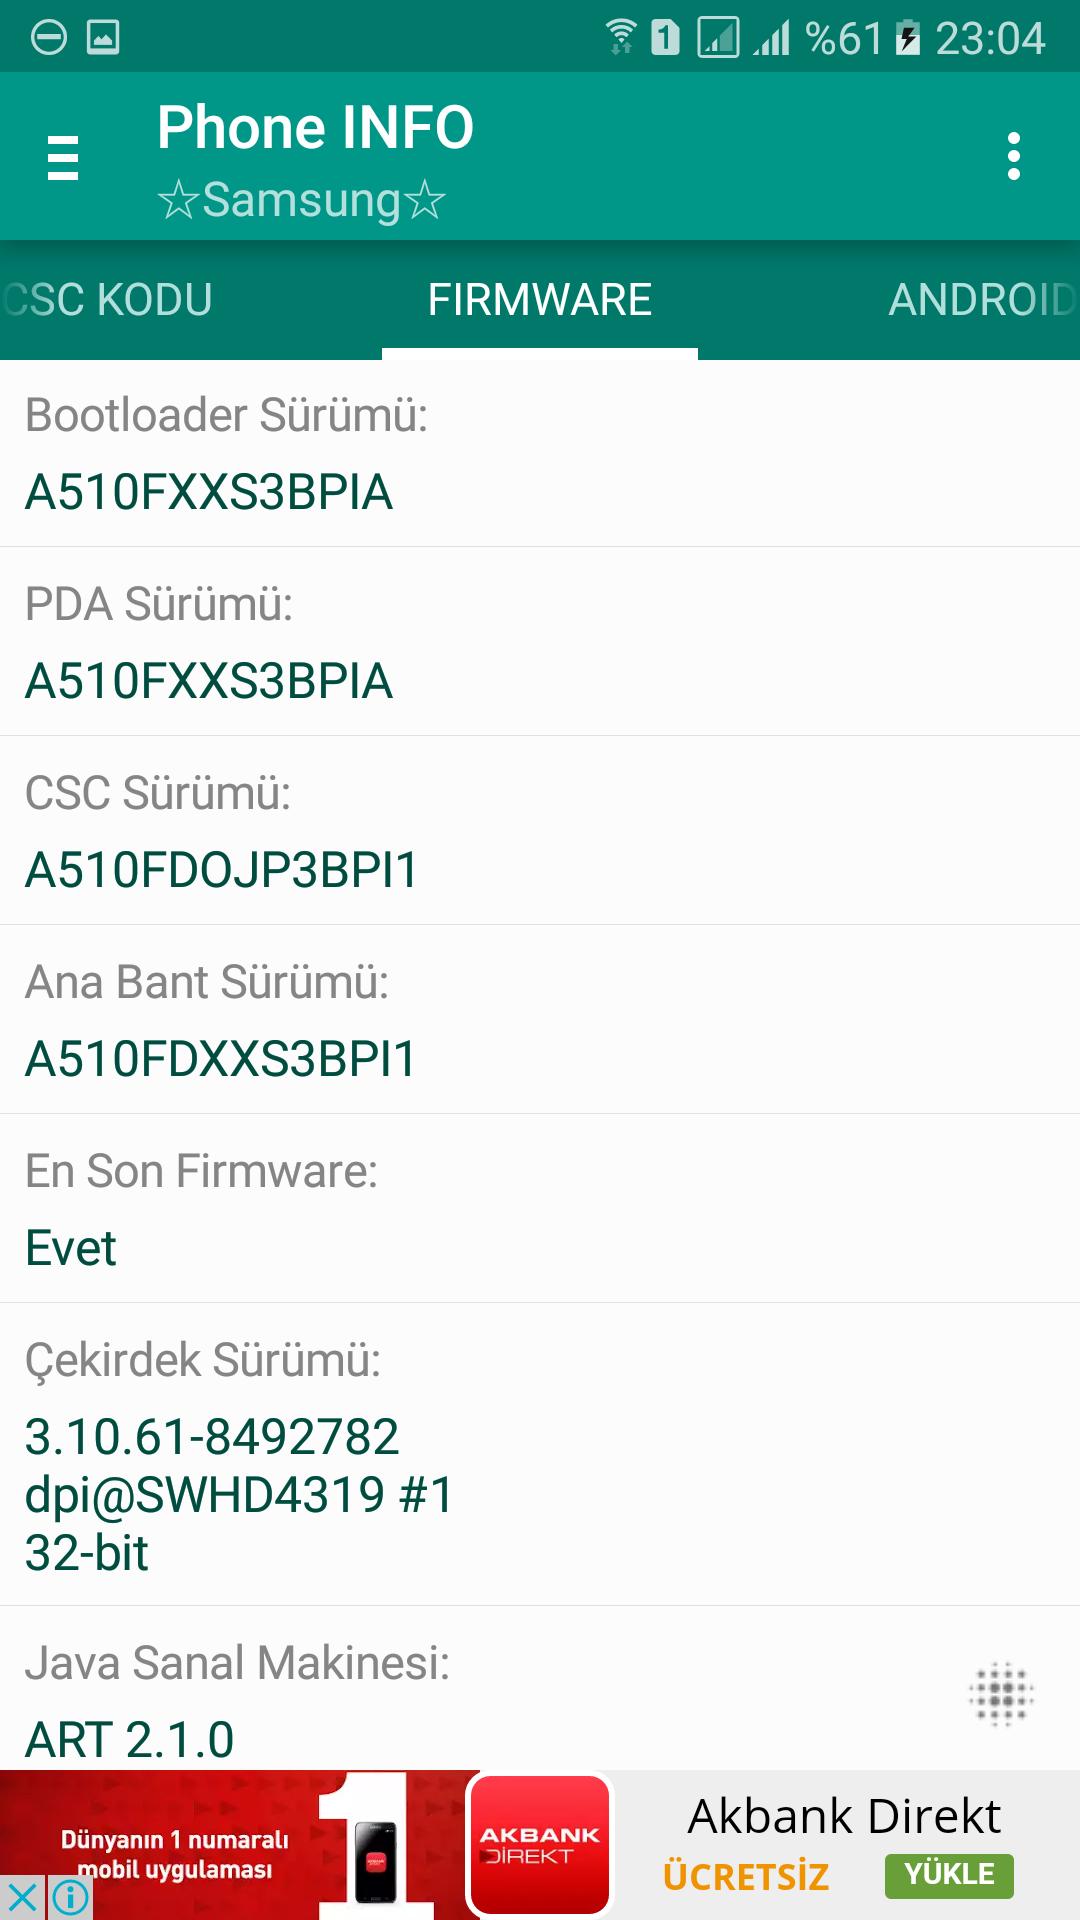 SAMSUNG GALAXY A5 2016 (SM-A510F) [ANA KONU]